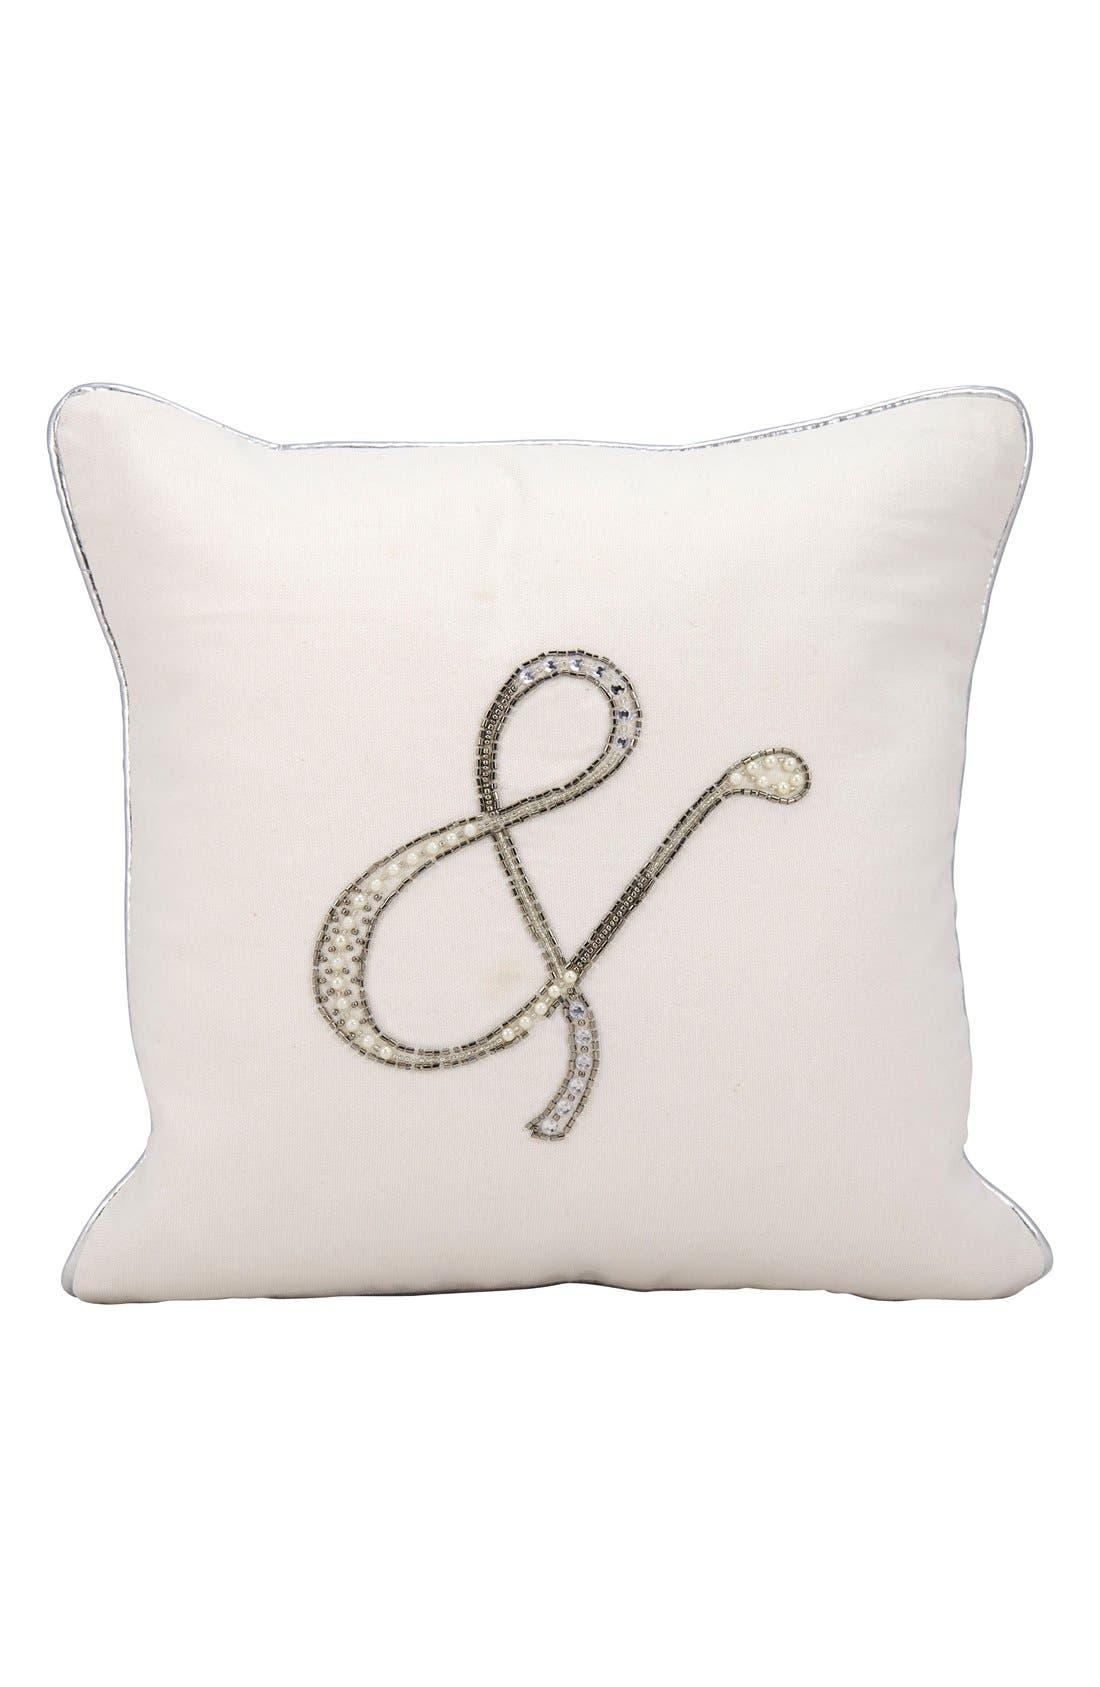 Embellished Wedding Pillow,                         Main,                         color, 100